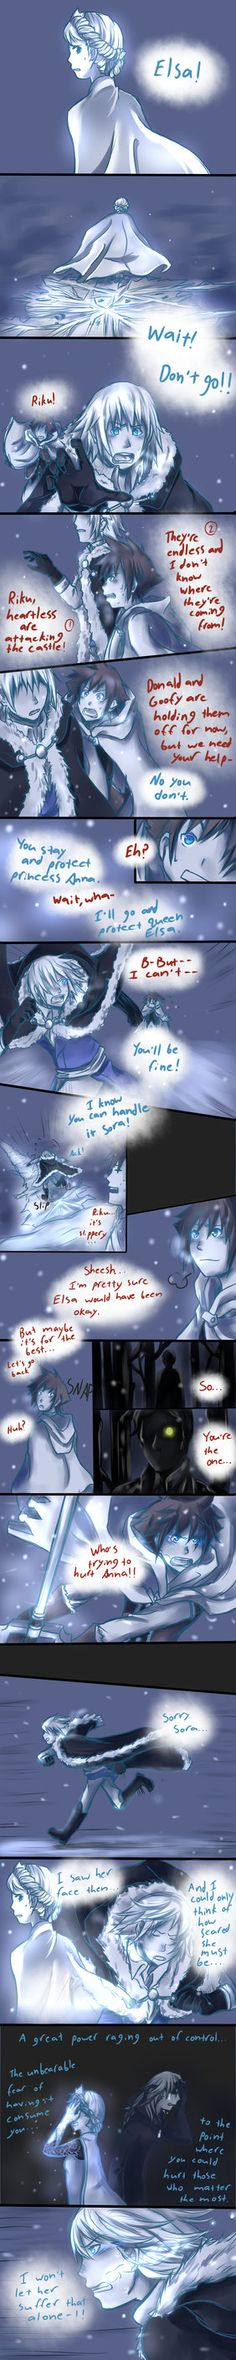 Frozen/KH: To Protect by Medli45 on DeviantArt